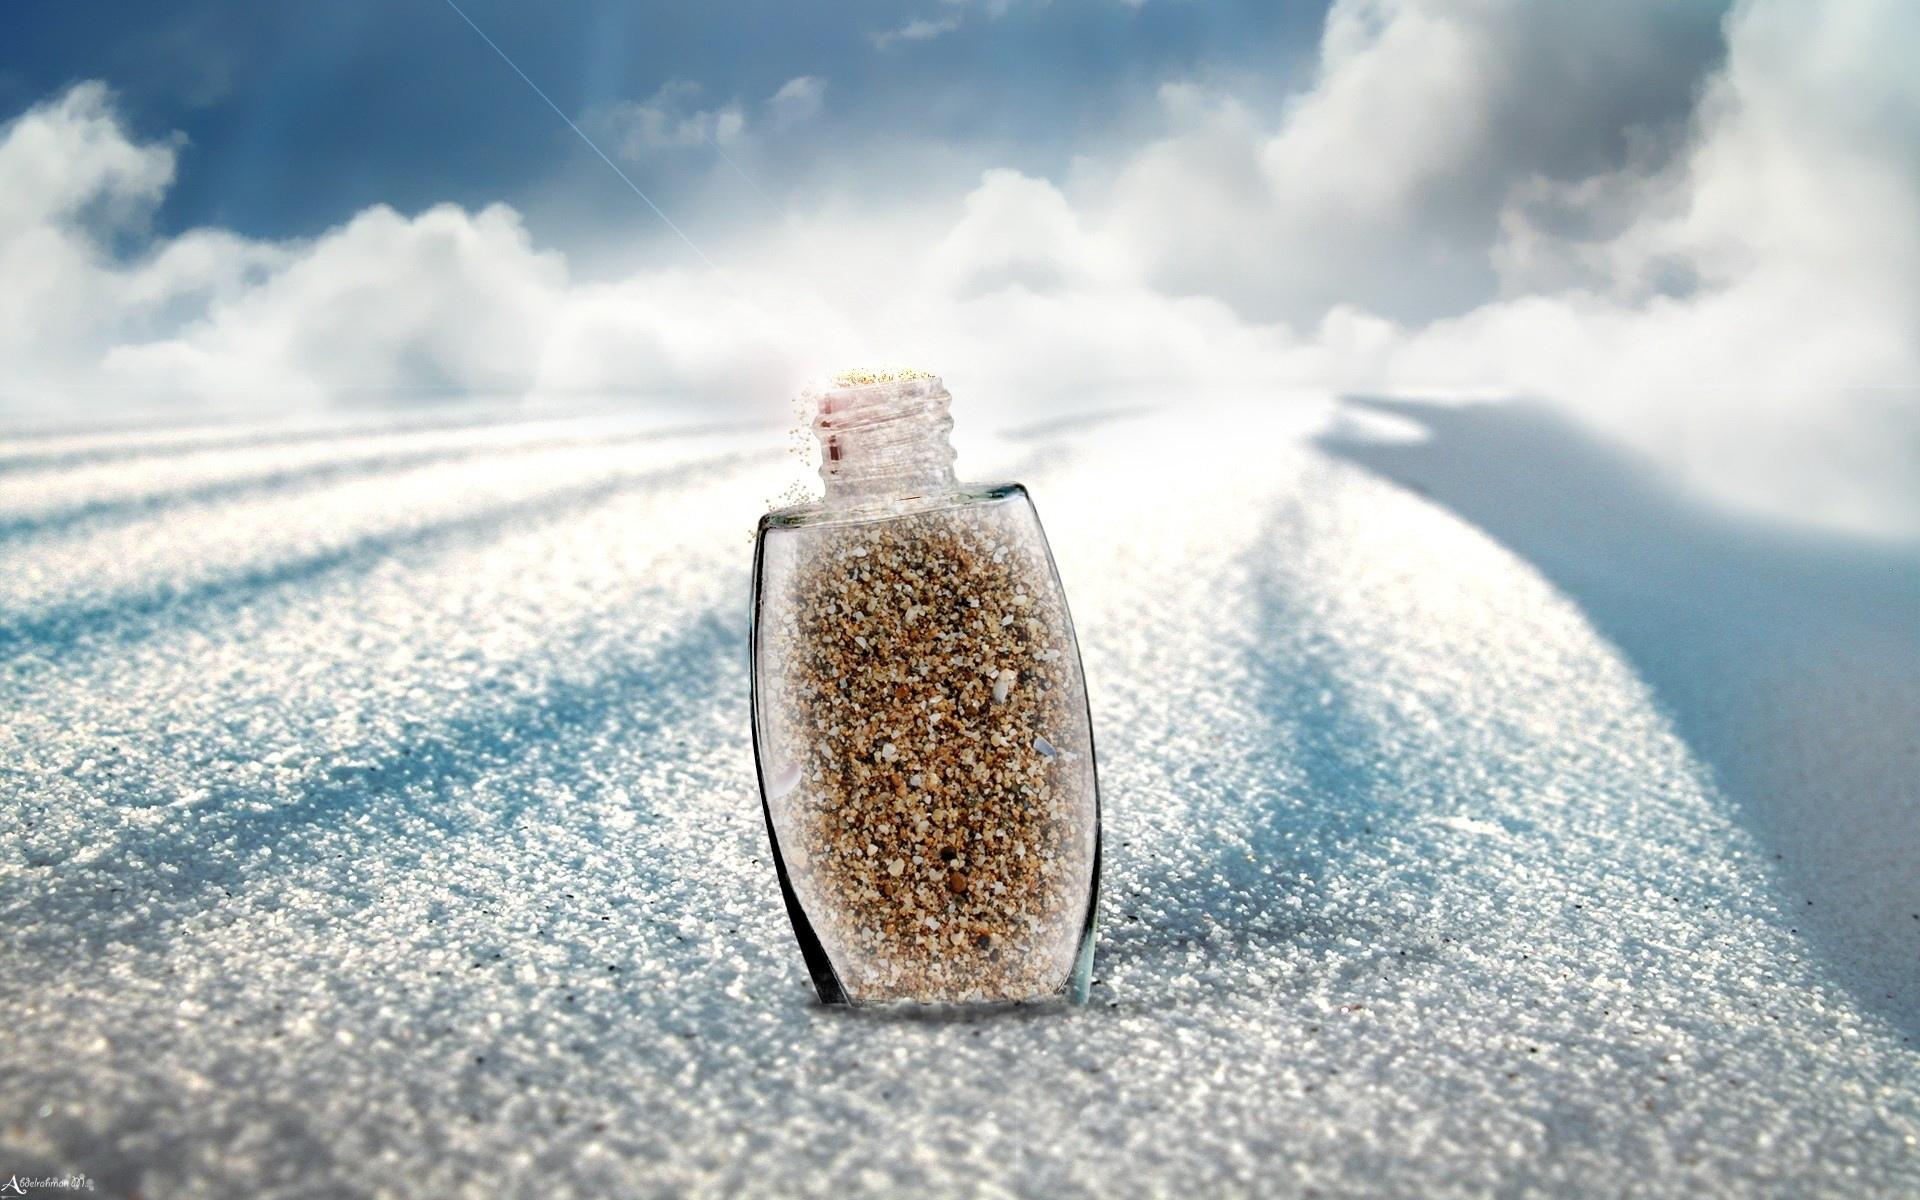 bokeh sand time contrast dunes landscapes sky clouds bright dream